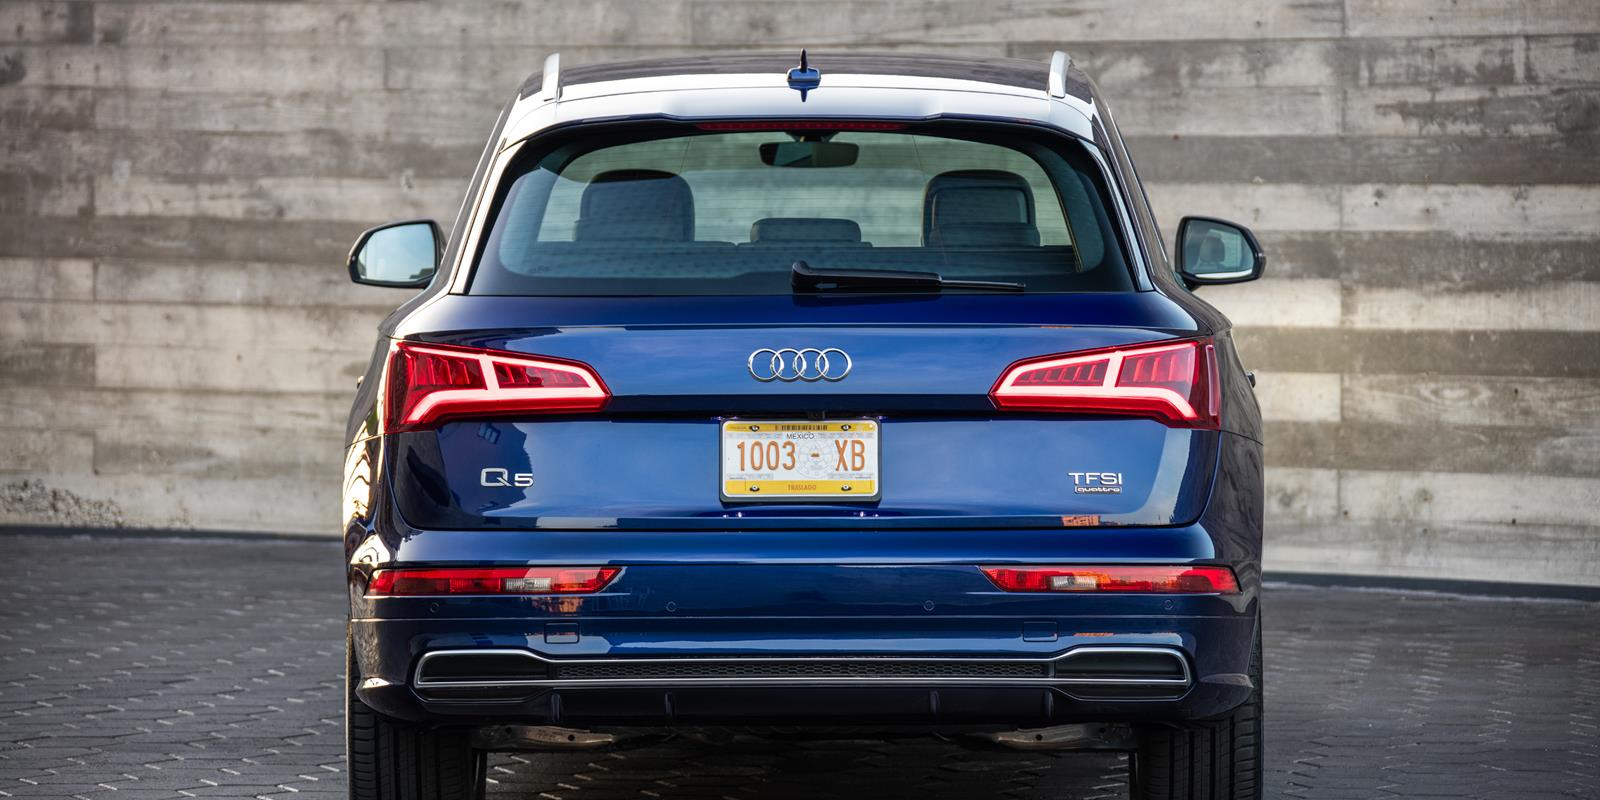 Audi Q5 photo 171916